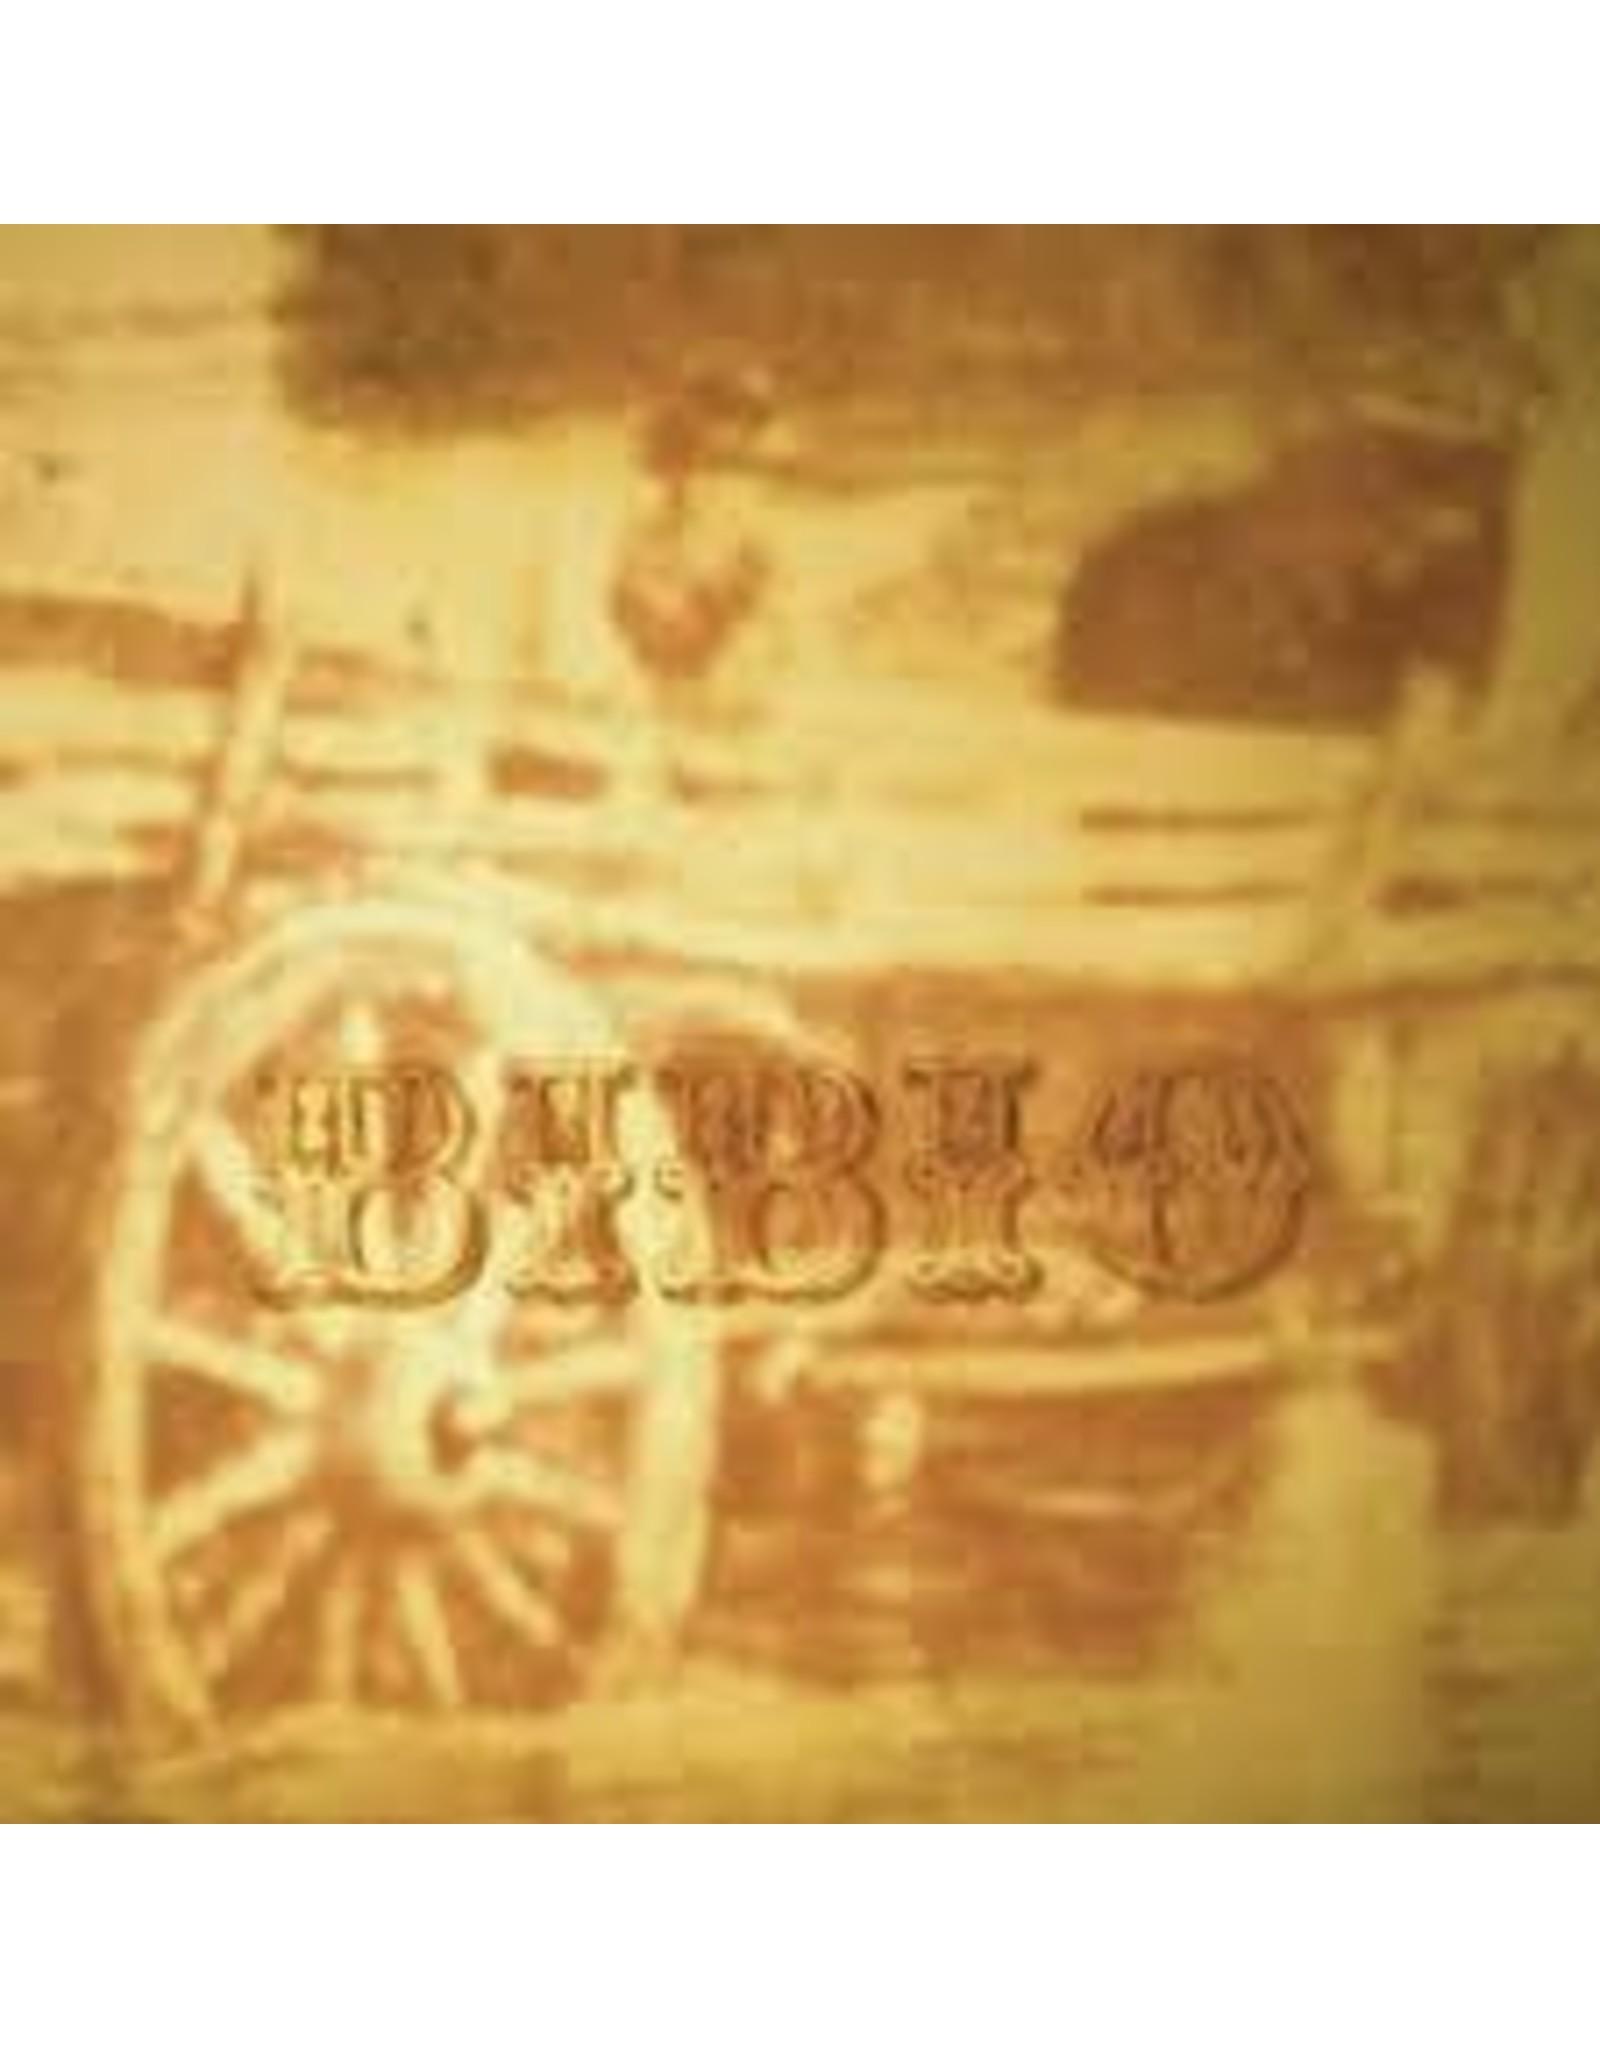 New Vinyl Bibio - Hand-Cranked LP